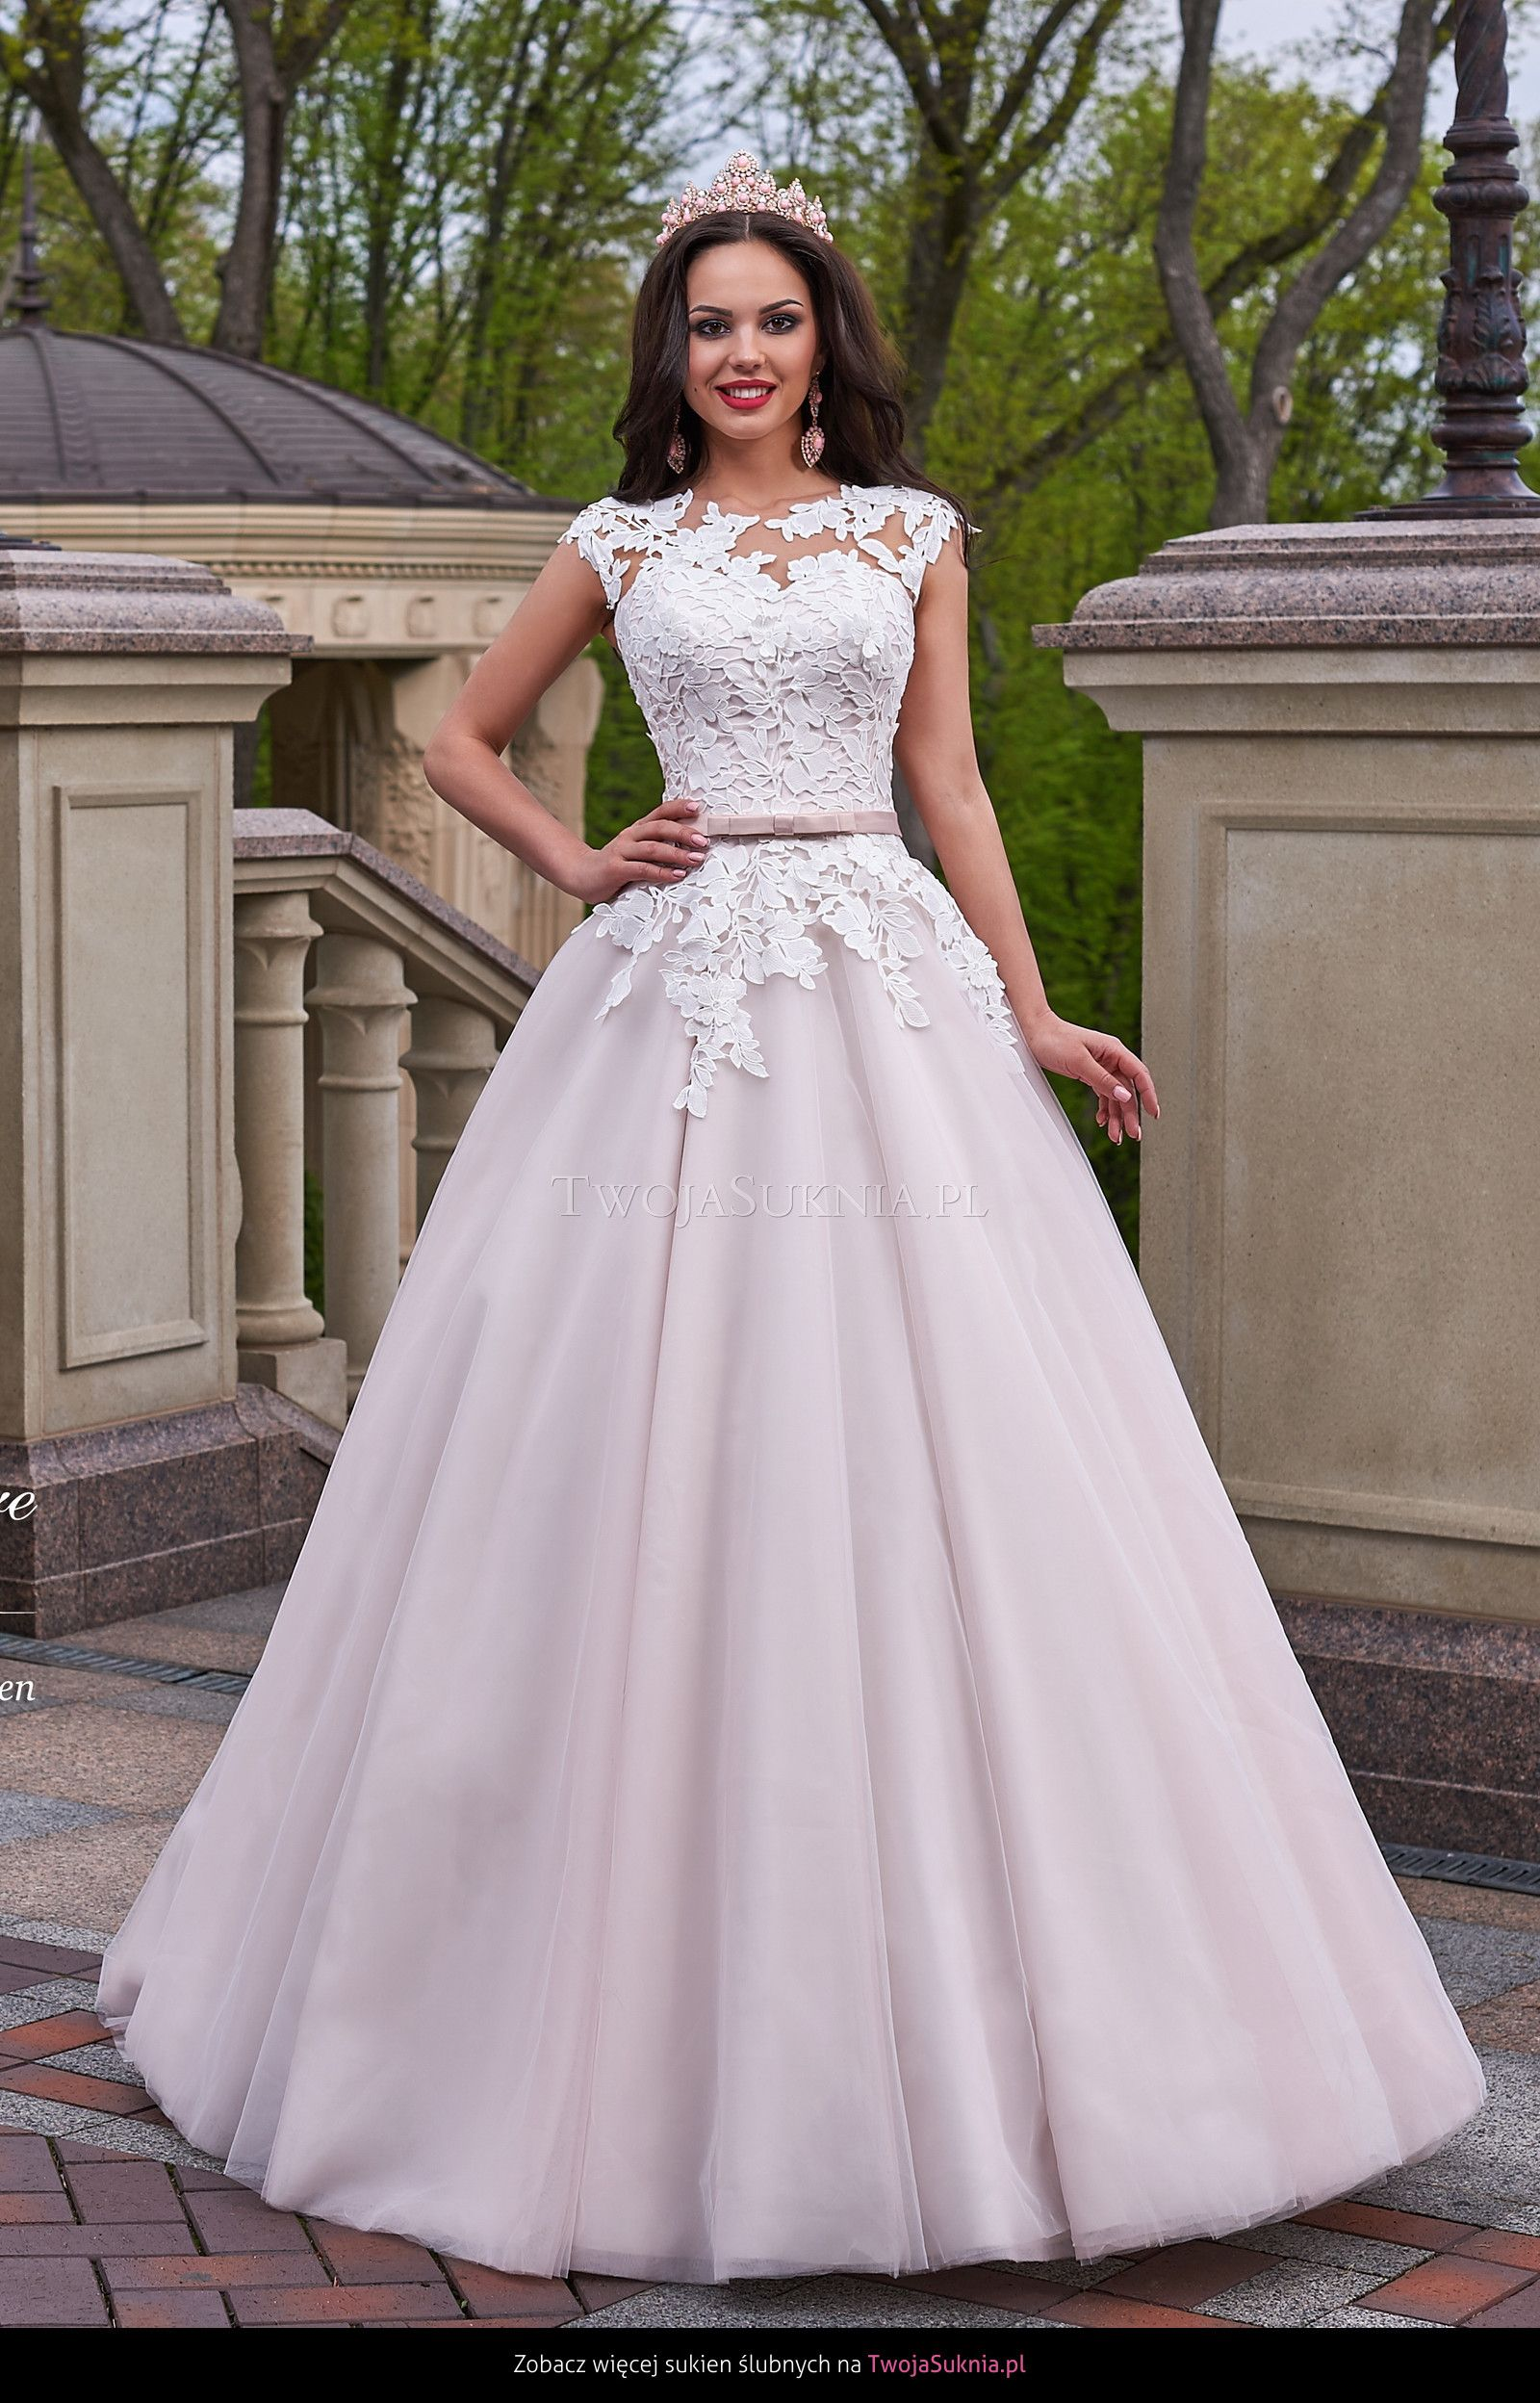 Jasmine Empire - Tamila - Miss Jasmine | suknie ślubne | Pinterest